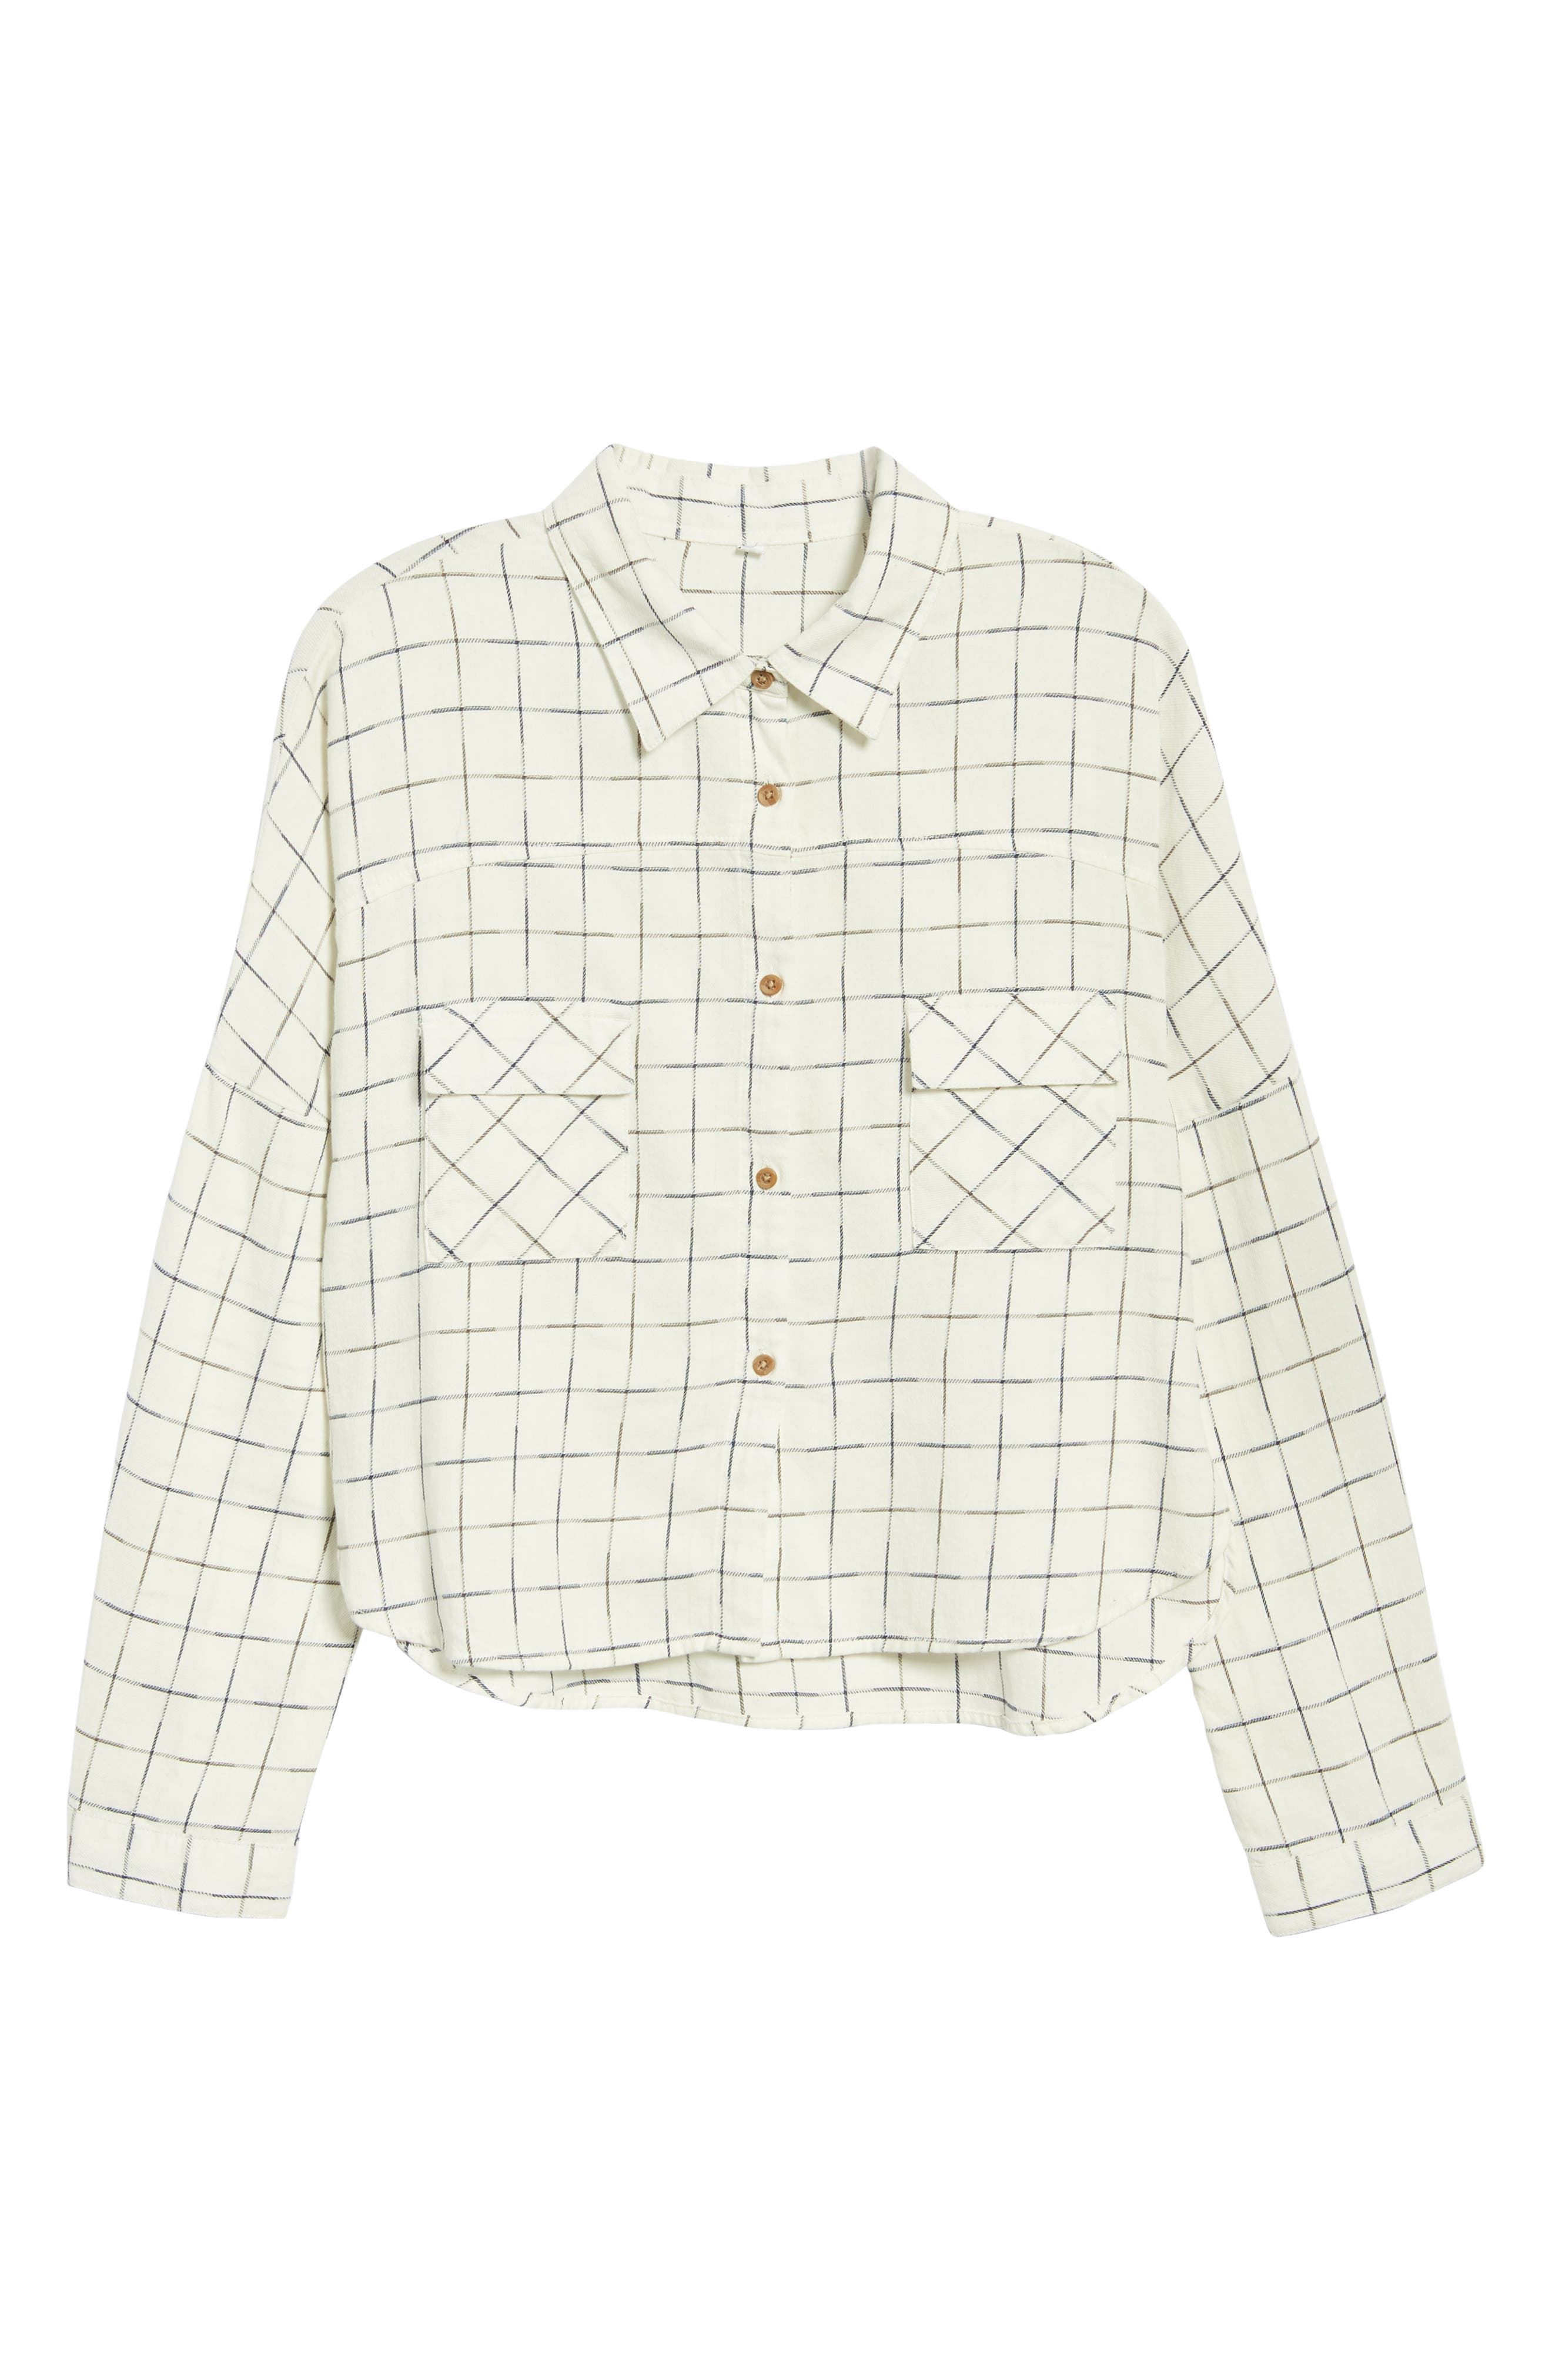 Check Flannel Shirt,                             Alternate thumbnail 6, color,                             NAVY/ WHITE GRID